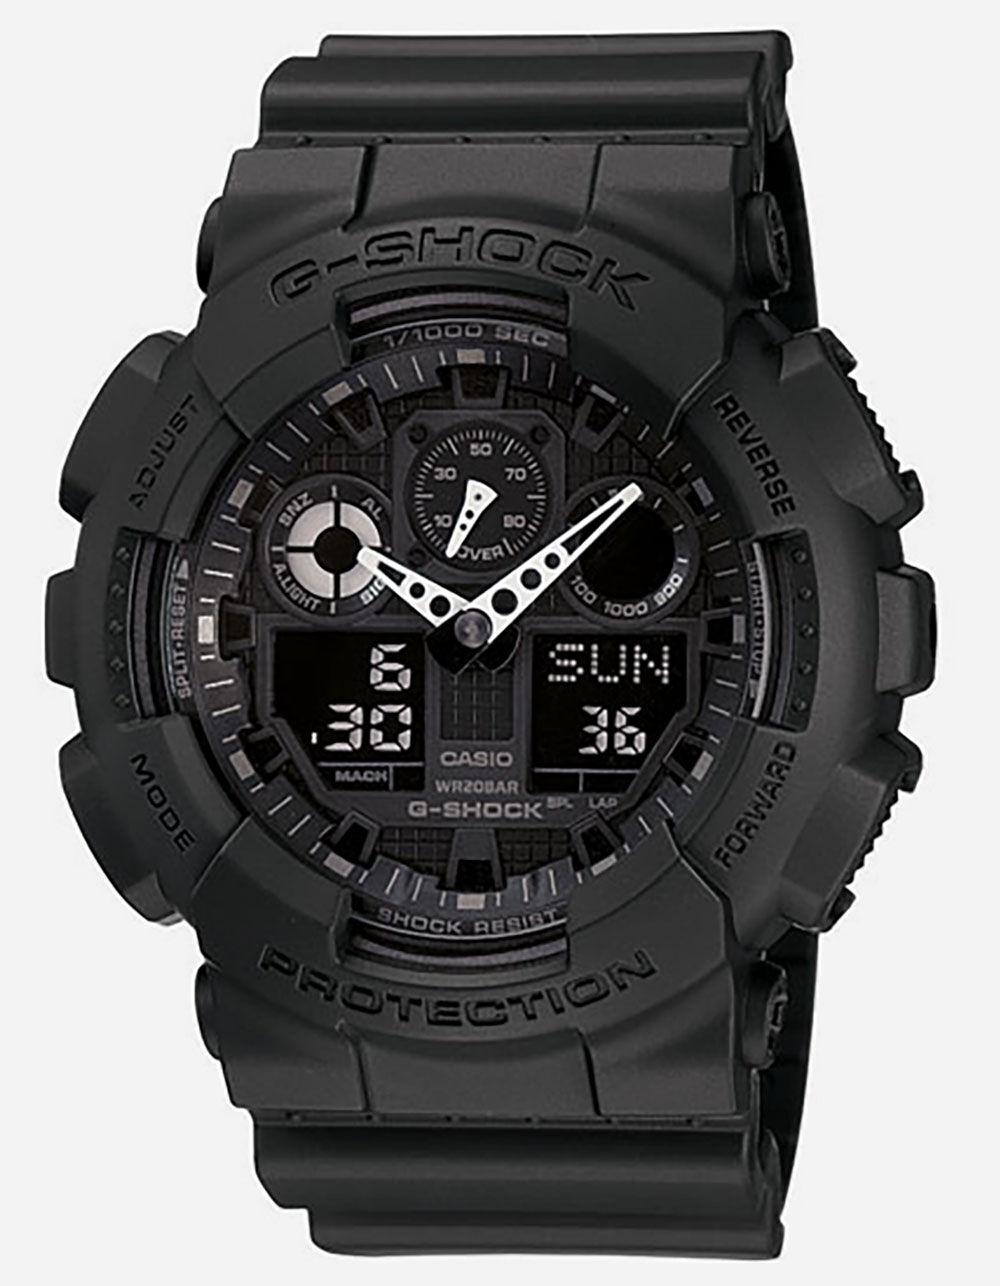 G-SHOCK GA100-1A1 Watch